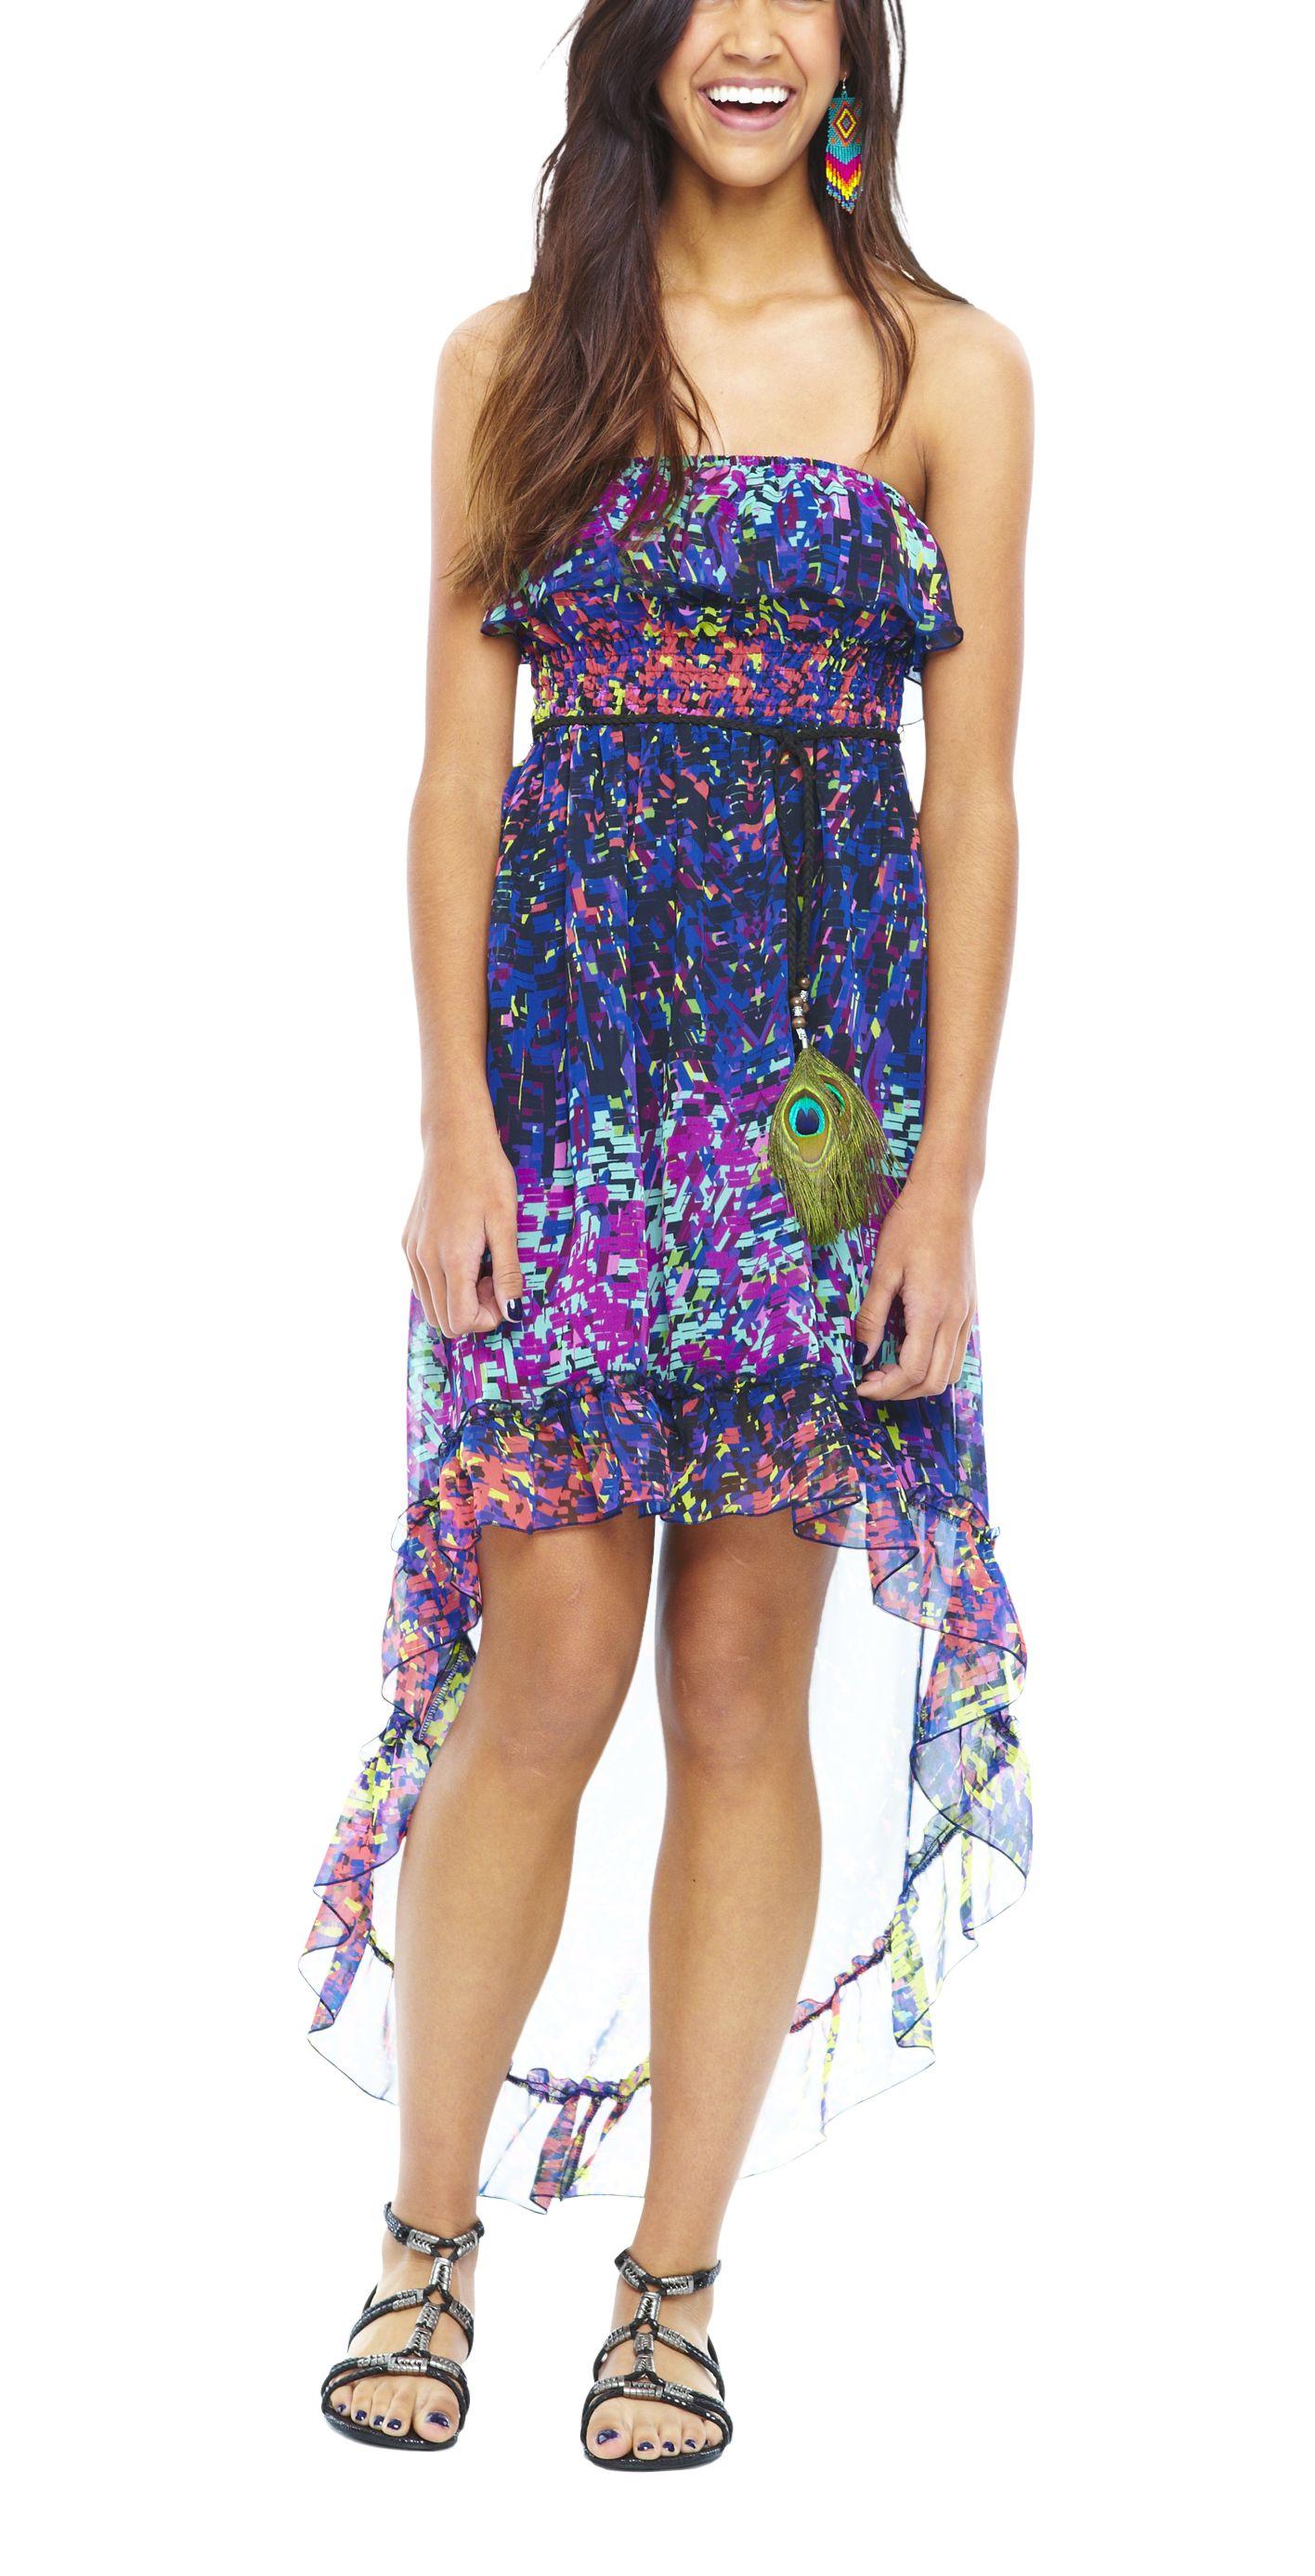 Ruffle Some Feathers Juniors Self Esteem Ruffle Tube Dress Teens Dresses Dresses For Teens Fashion [ 2773 x 1416 Pixel ]